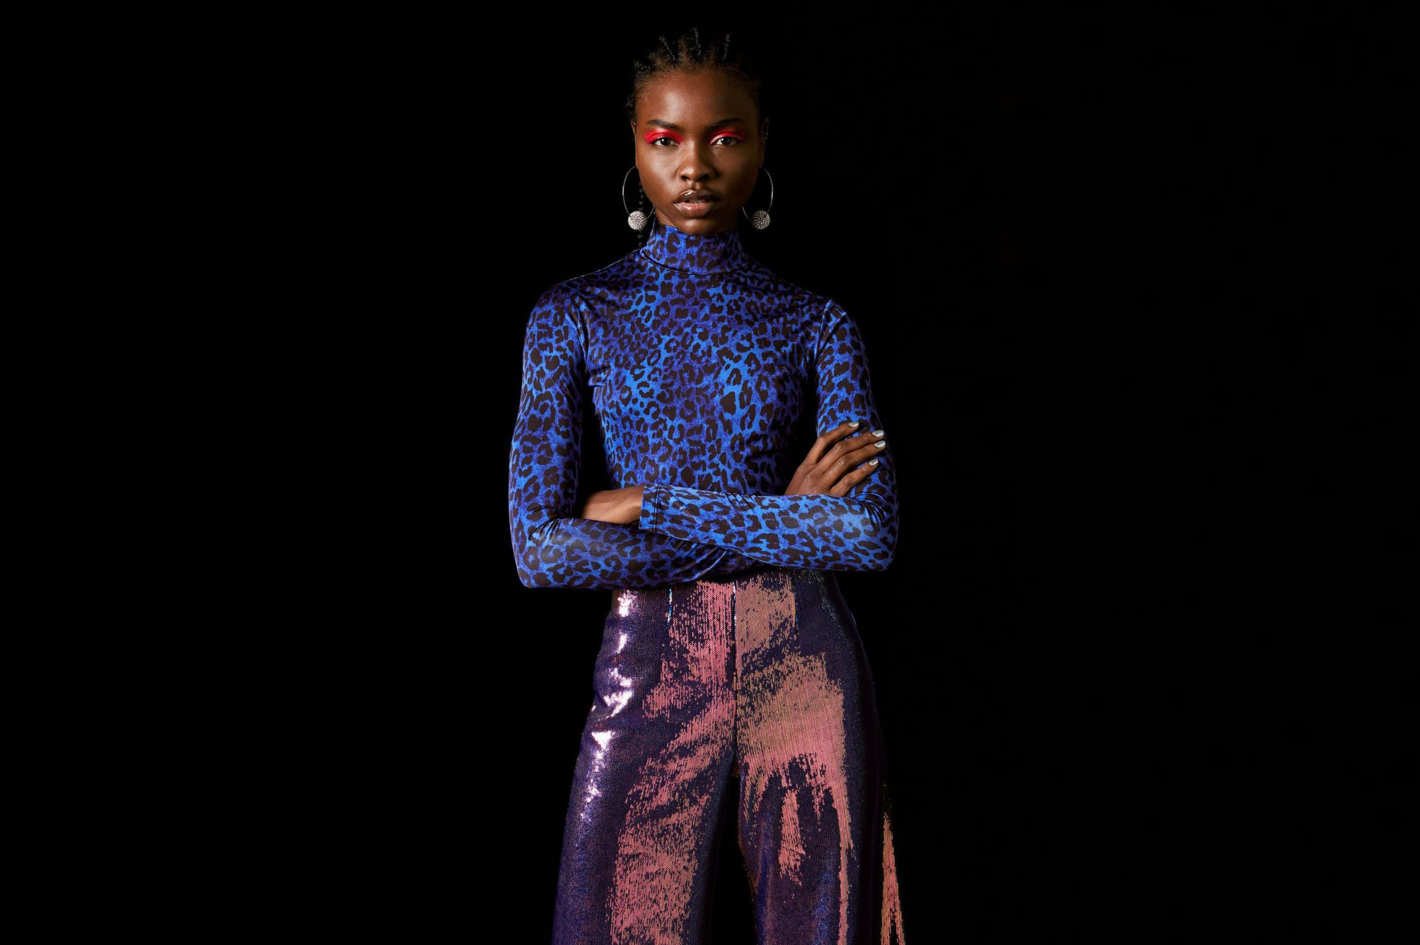 Cheetah Bodysuit by Topshop x Halpern